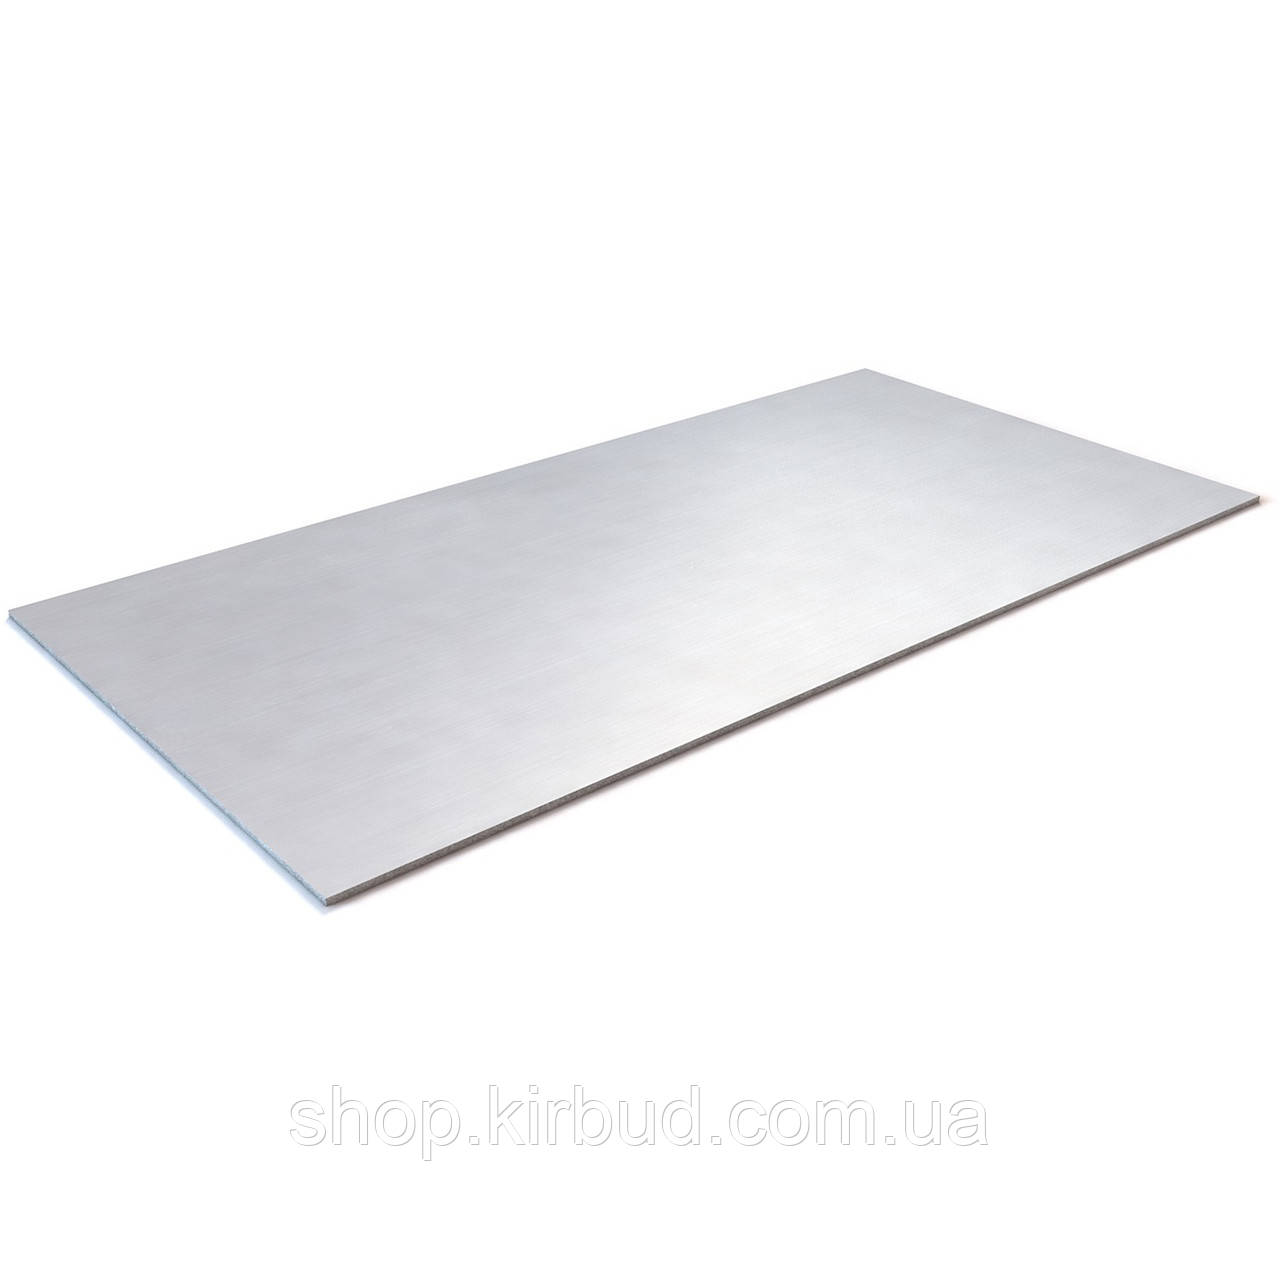 Лист х/к 1,5 мм ст. 08кп 1,25х2,5м